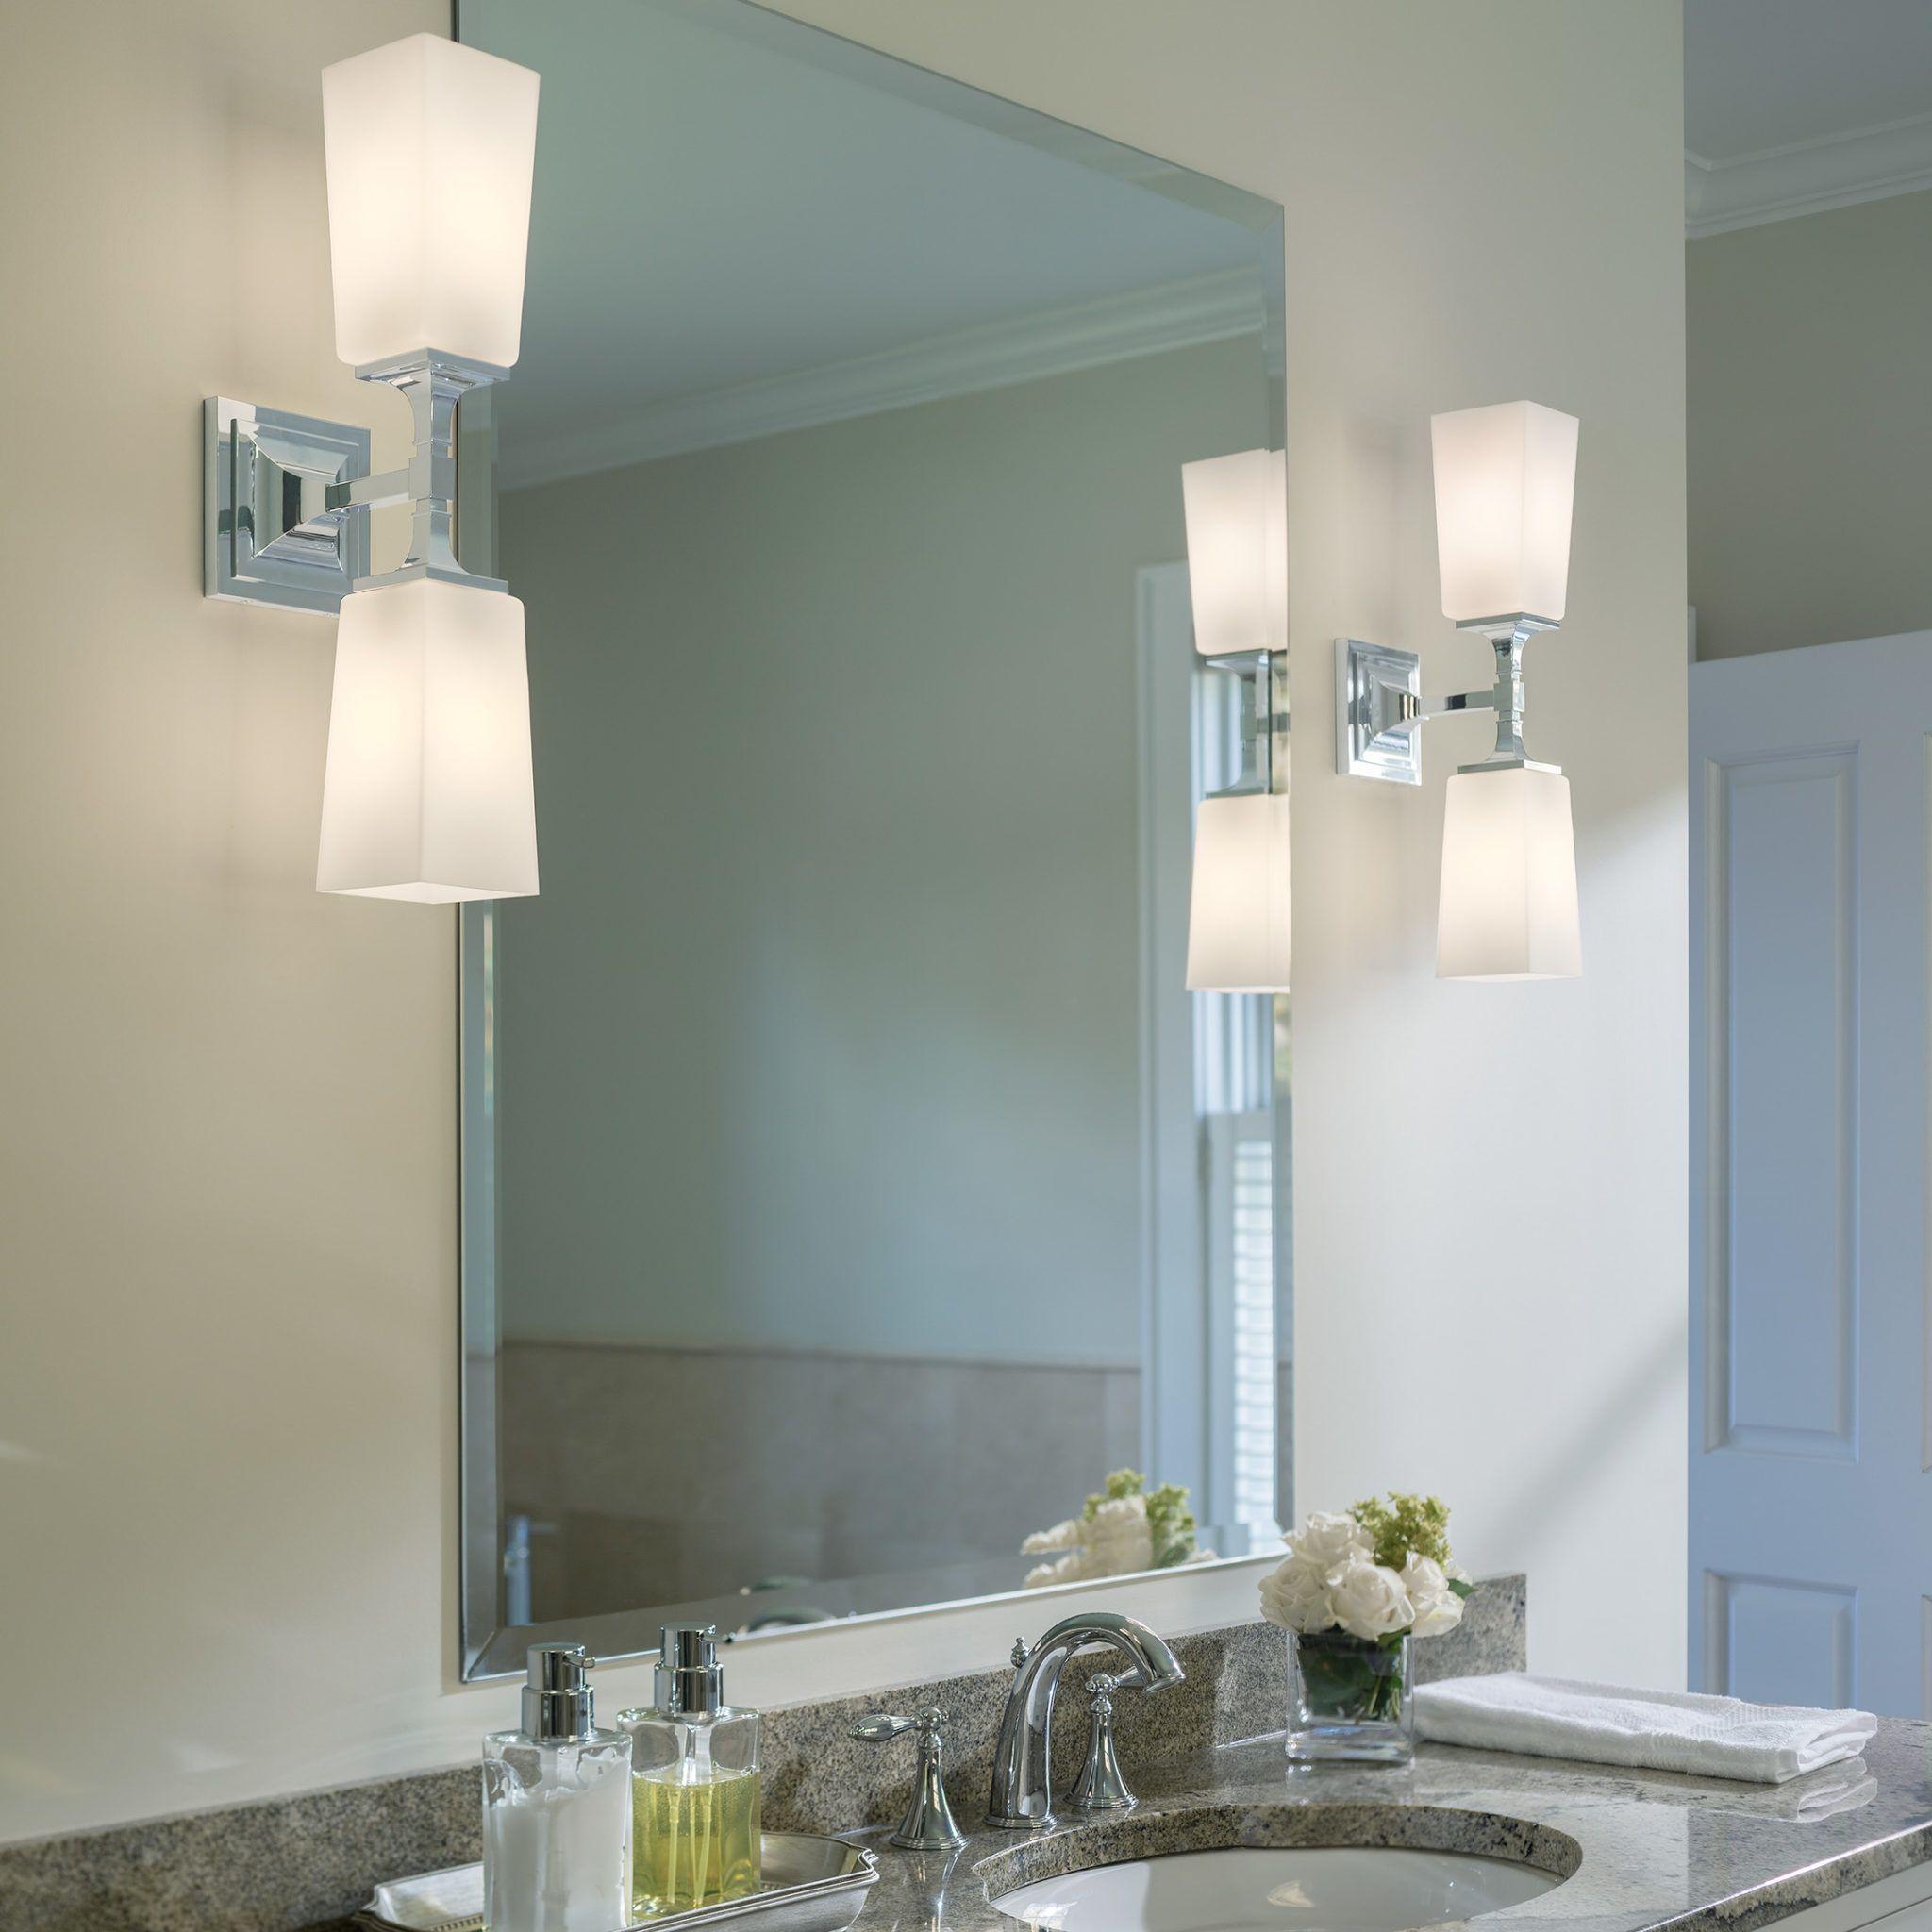 330 bathroom lighting ideas in 2021